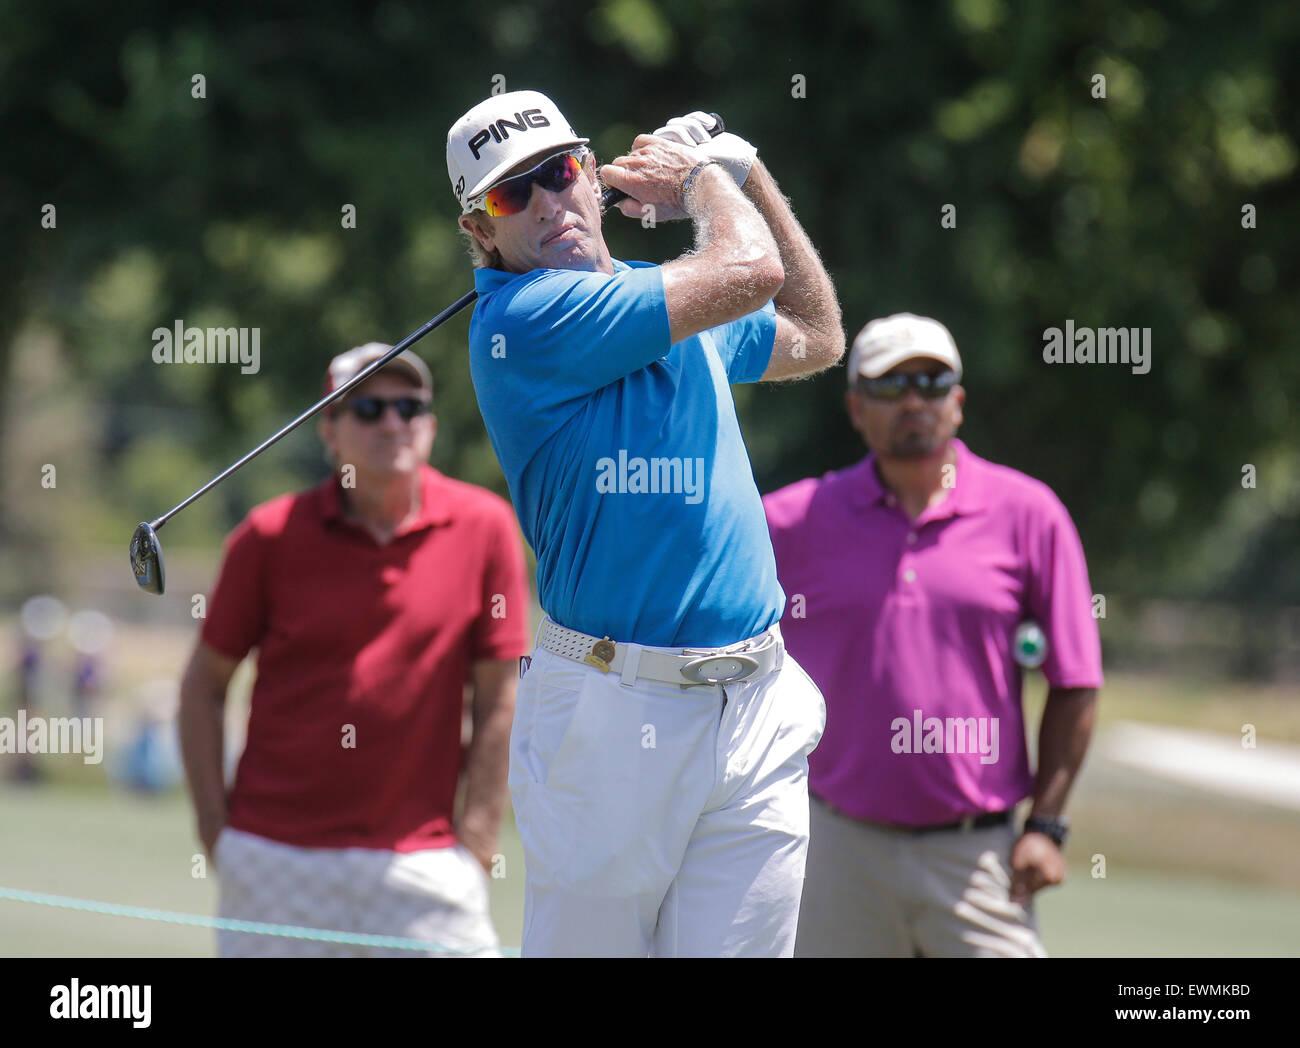 Sacramento, CA. 28th June, 2015. Grant Waite hitting off the fairway 15th hole during U.S Senior Open Championship - Stock Image